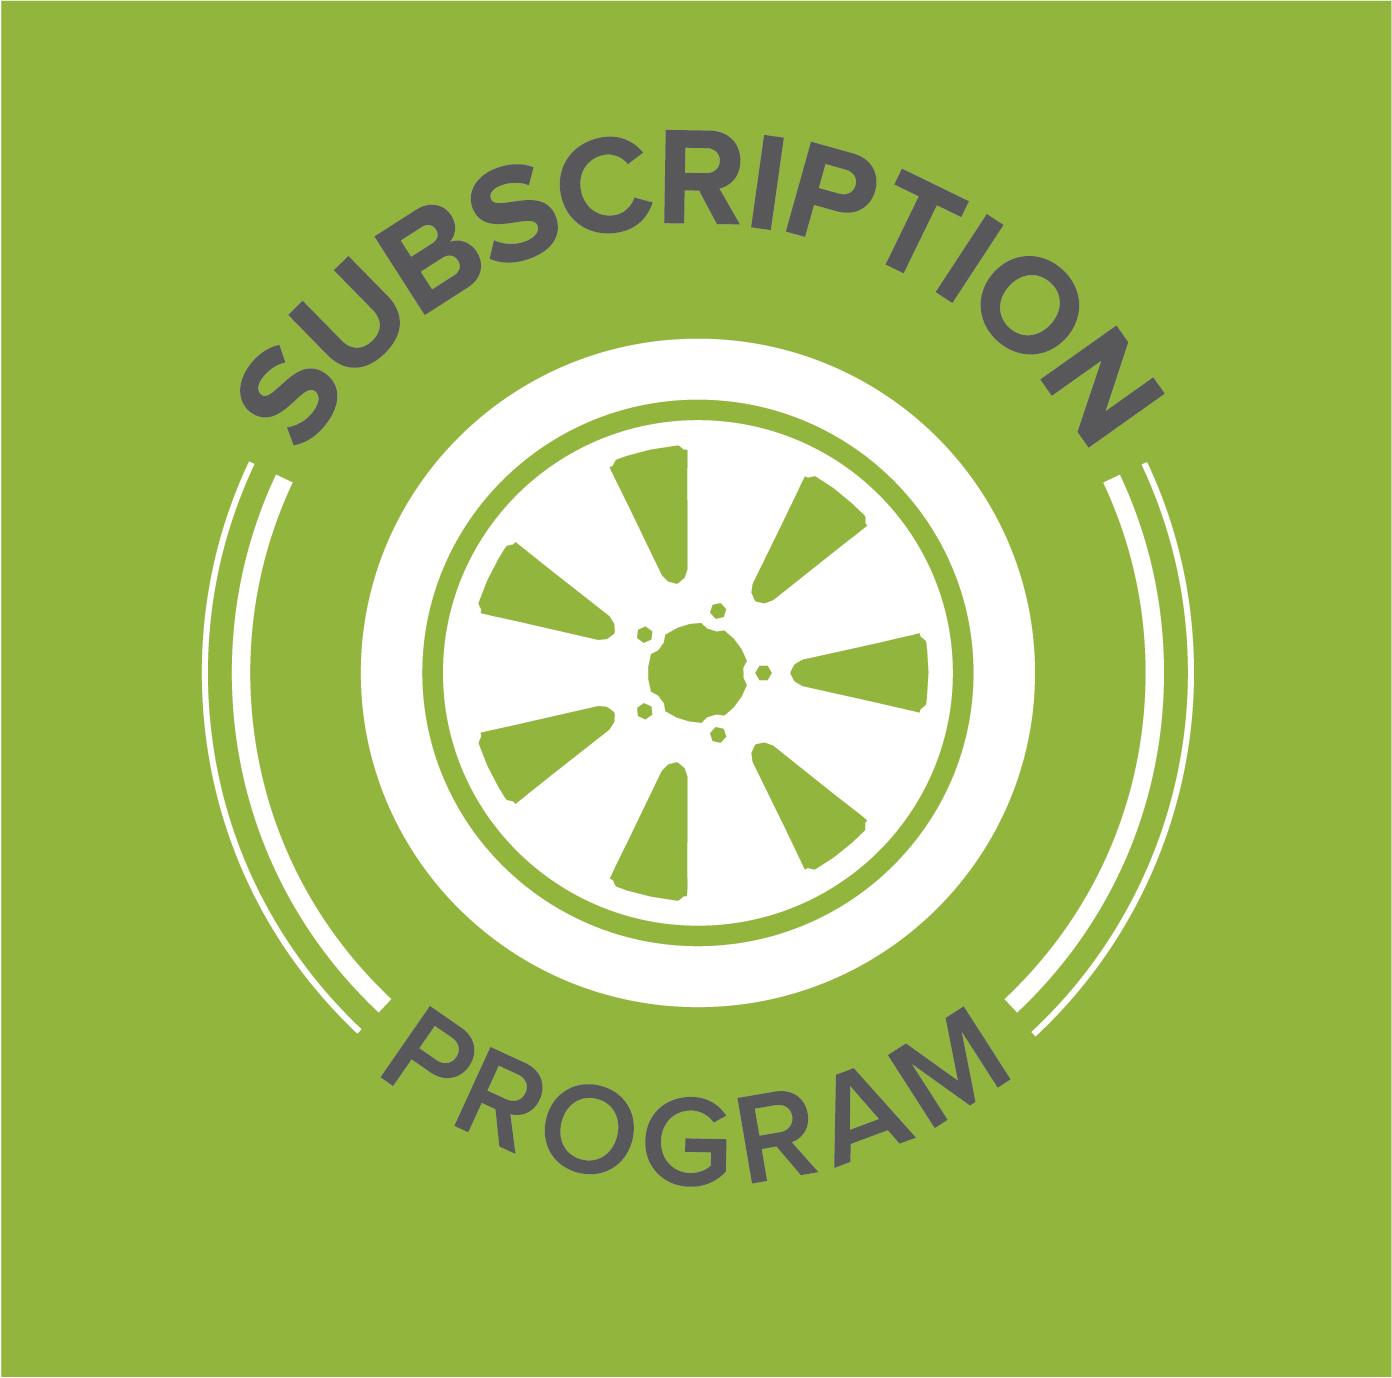 Subscription Program